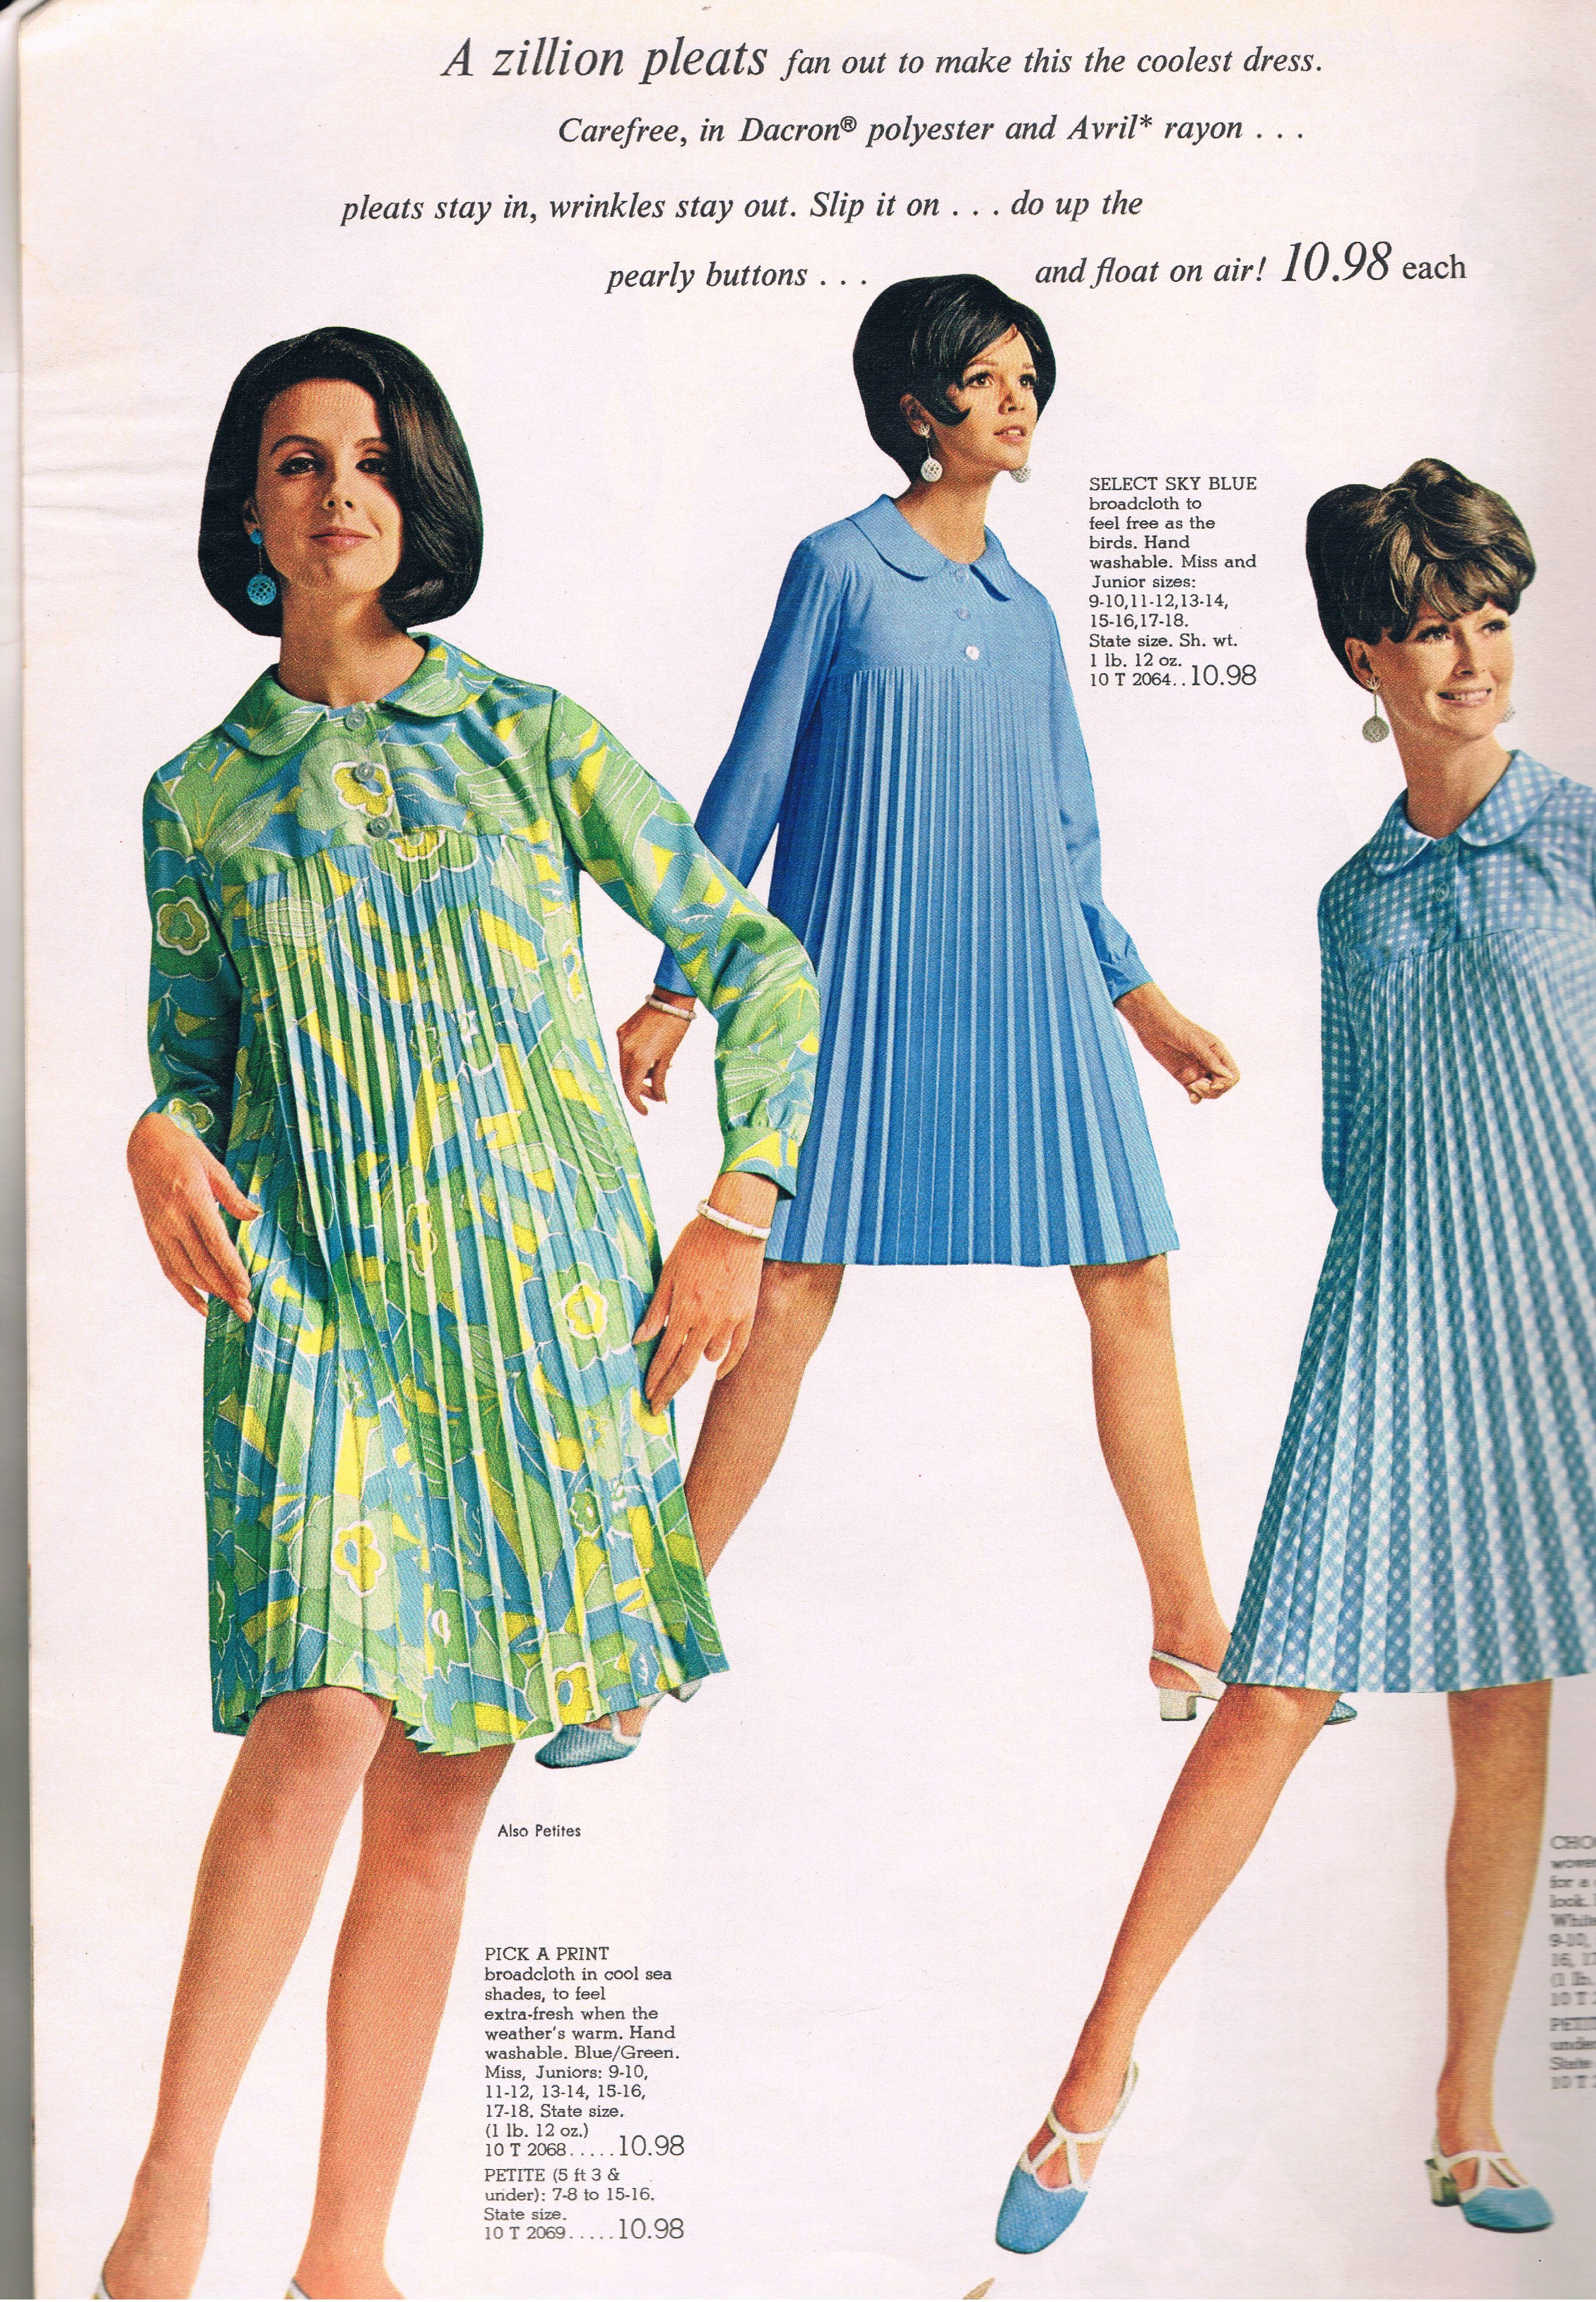 Spiegel 1968 60 s catalog fashions Pinterest